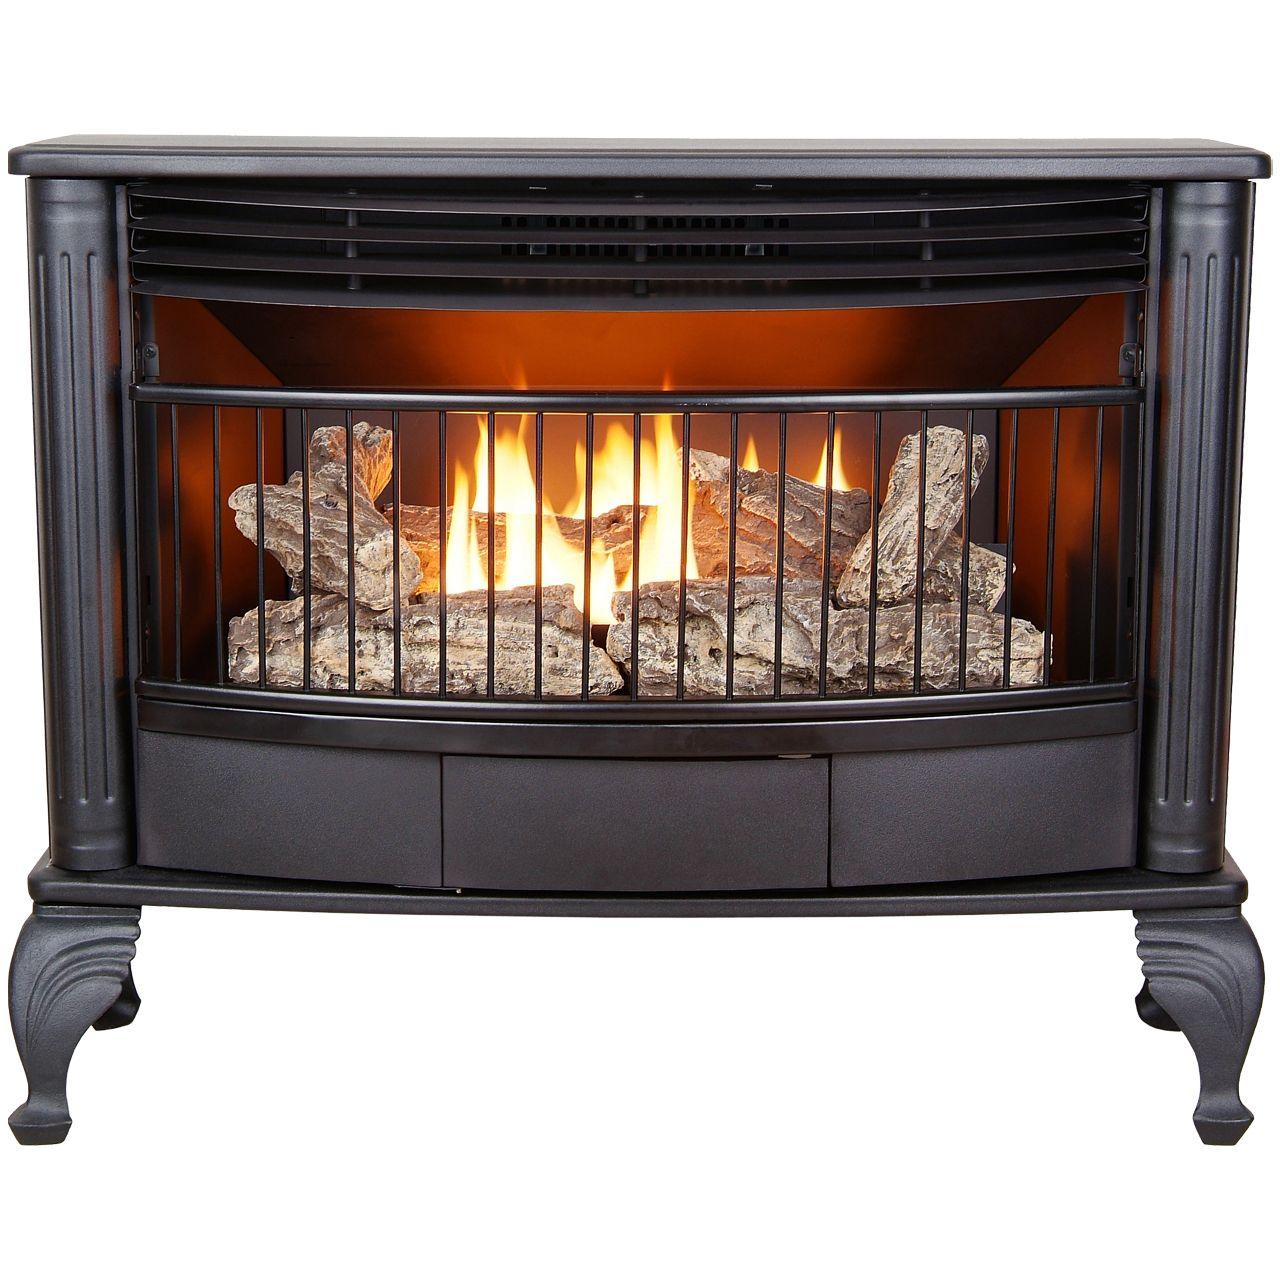 Procom Gas Stove Qnsd250t Qd250t Vent Free Gas Fireplace Propane Gas Stove Natural Gas Stove